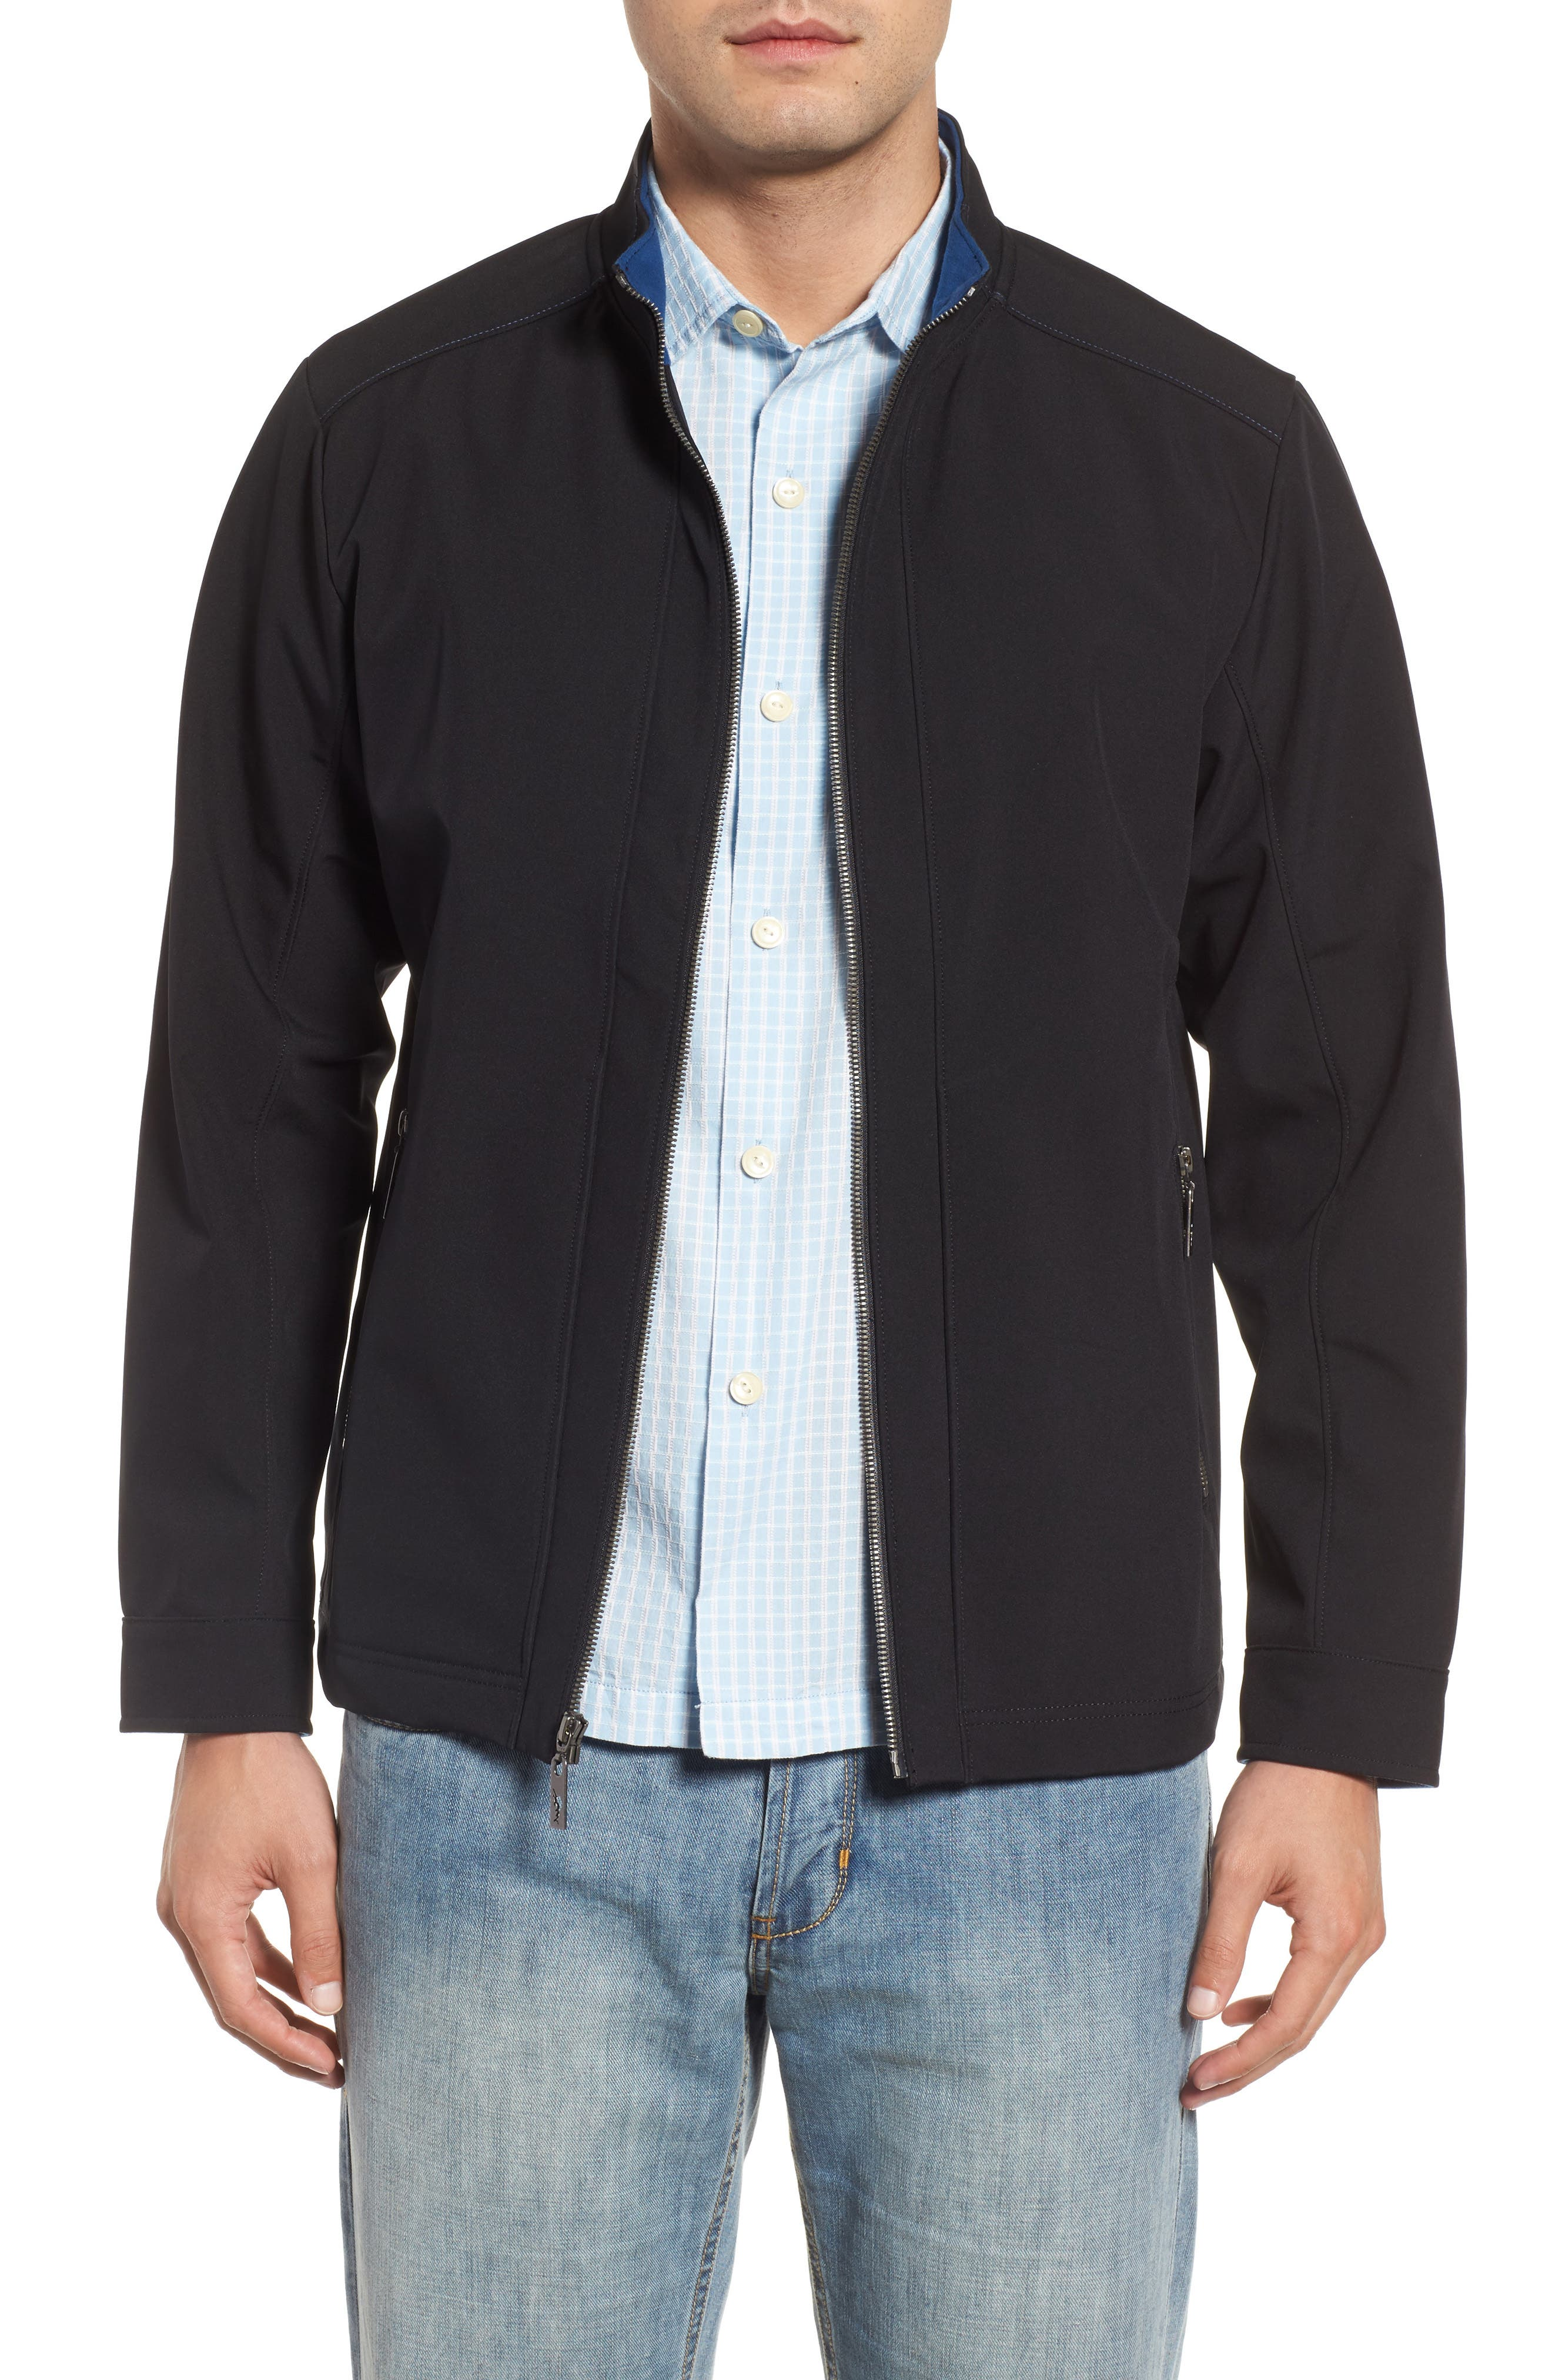 Main Image - Tommy Bahama Downswing Zip Jacket